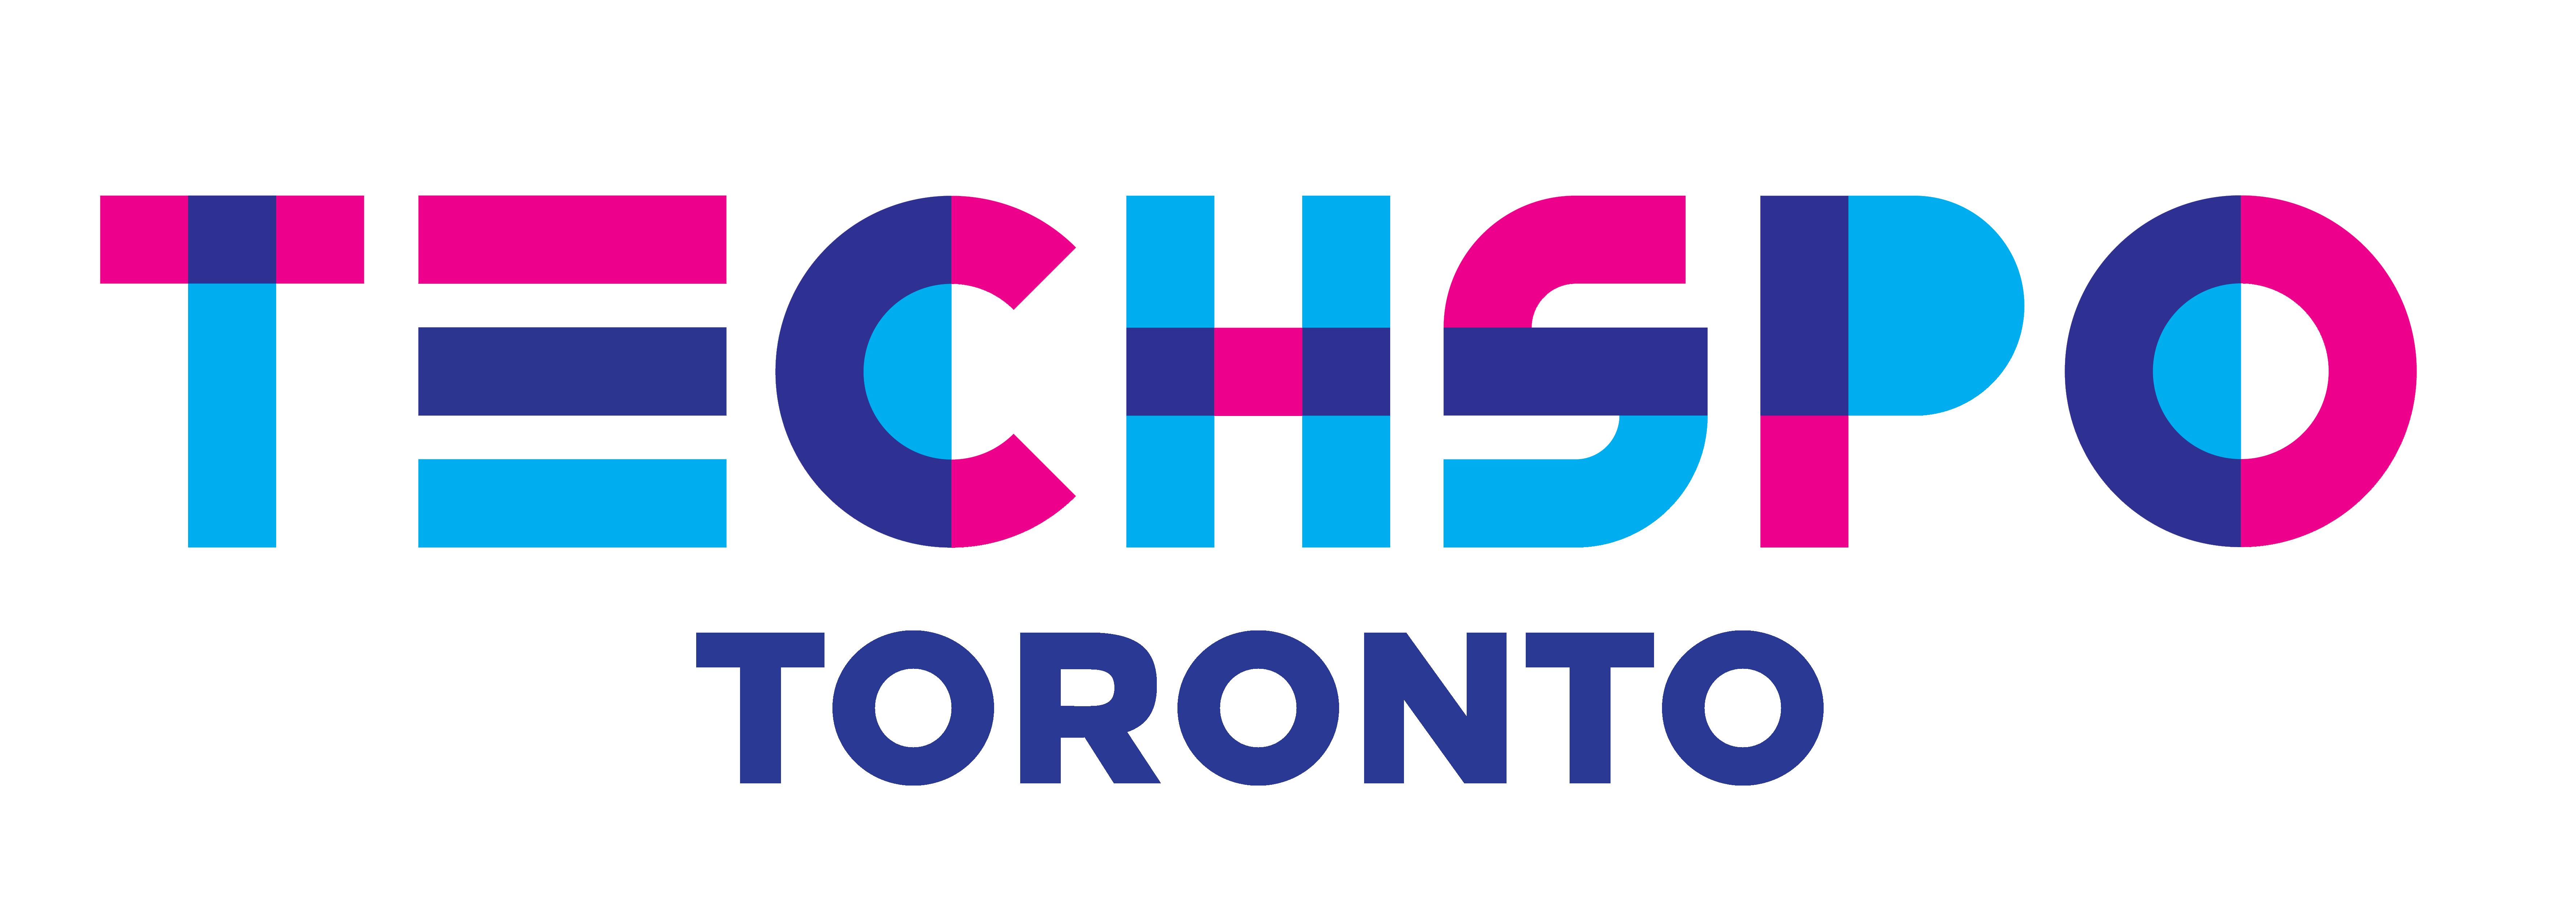 TECHSPO Toronto